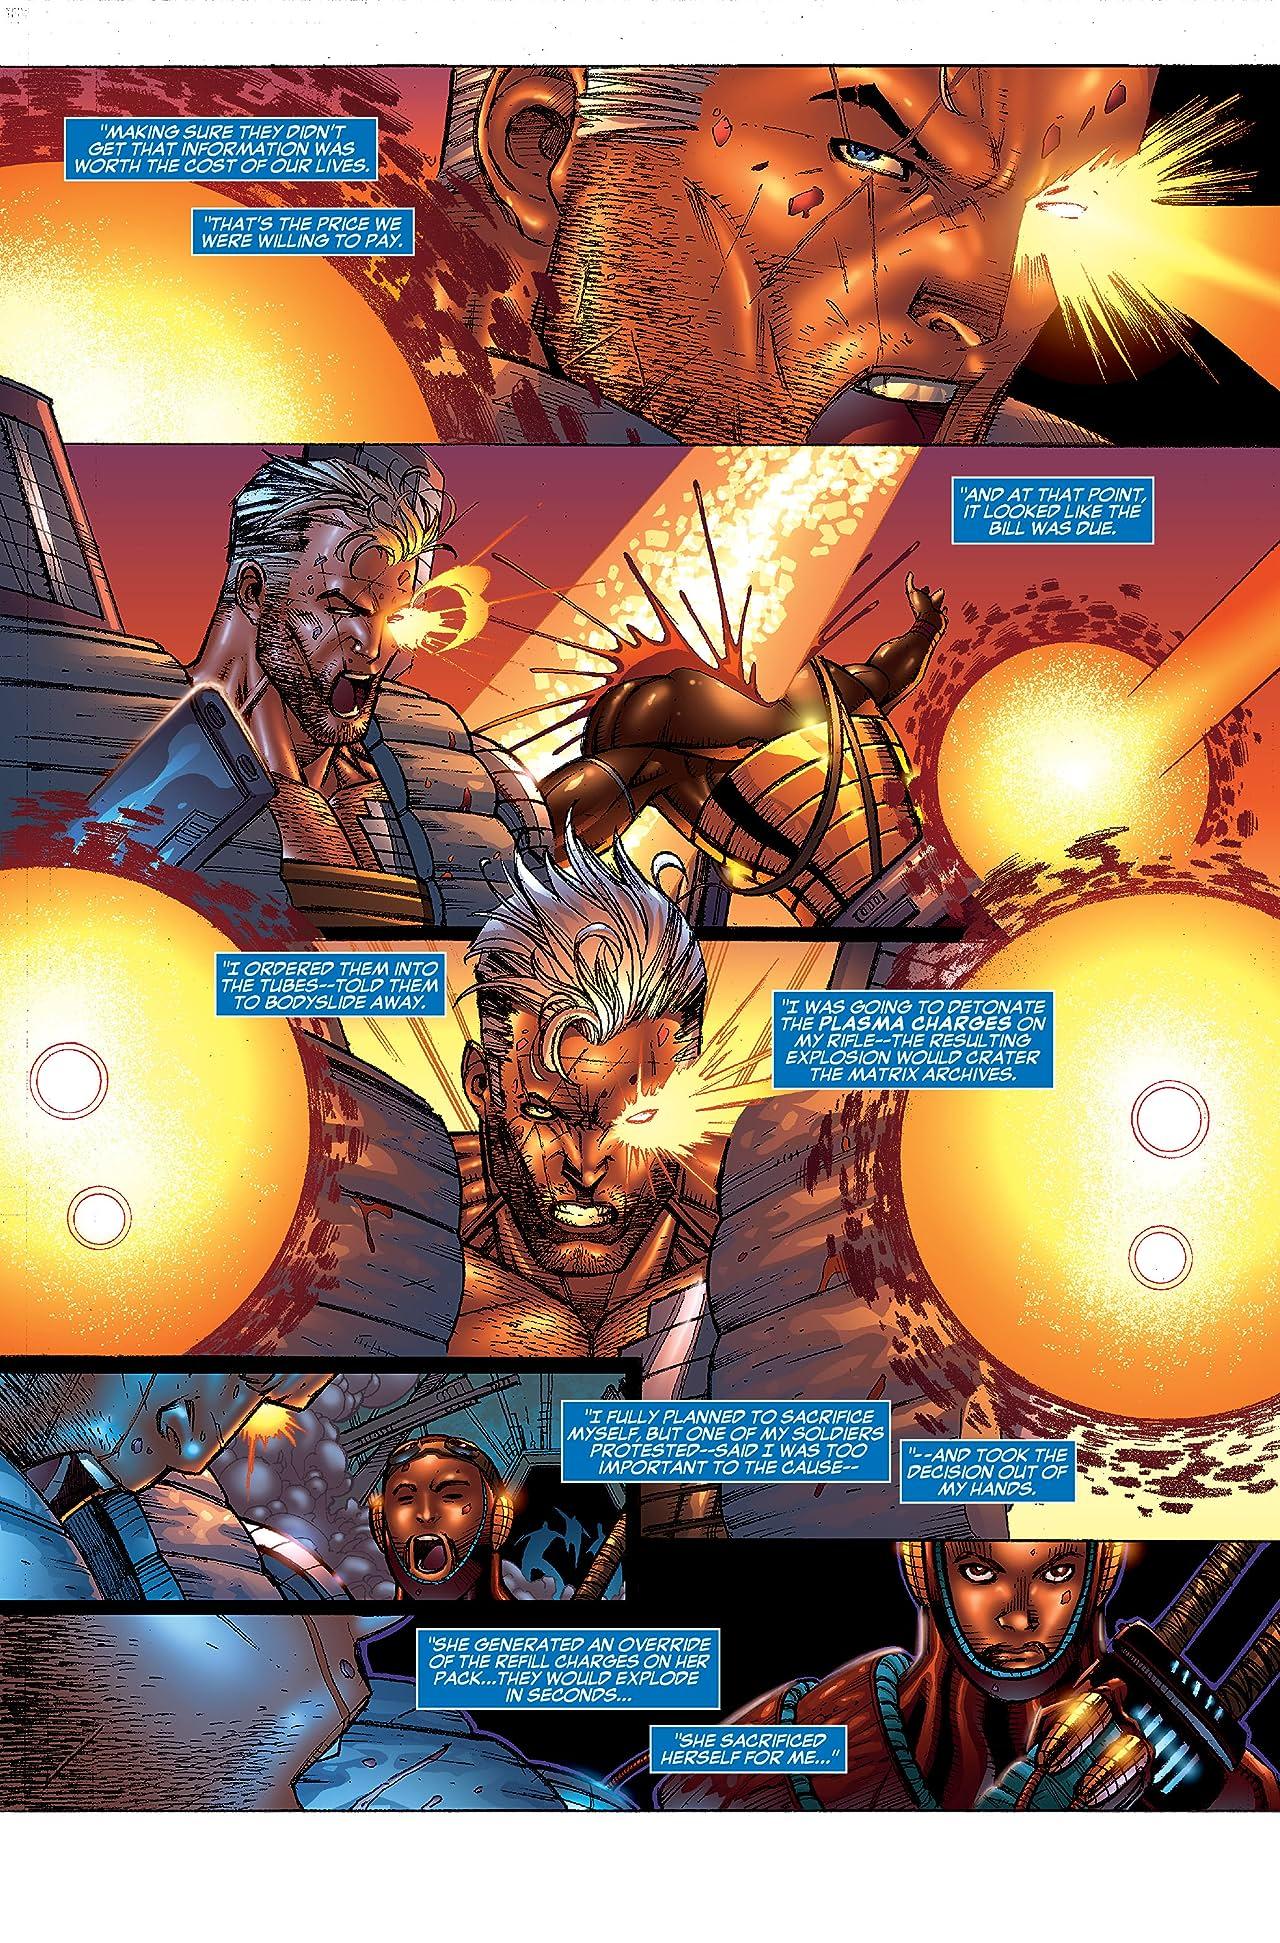 Cable & Deadpool #42